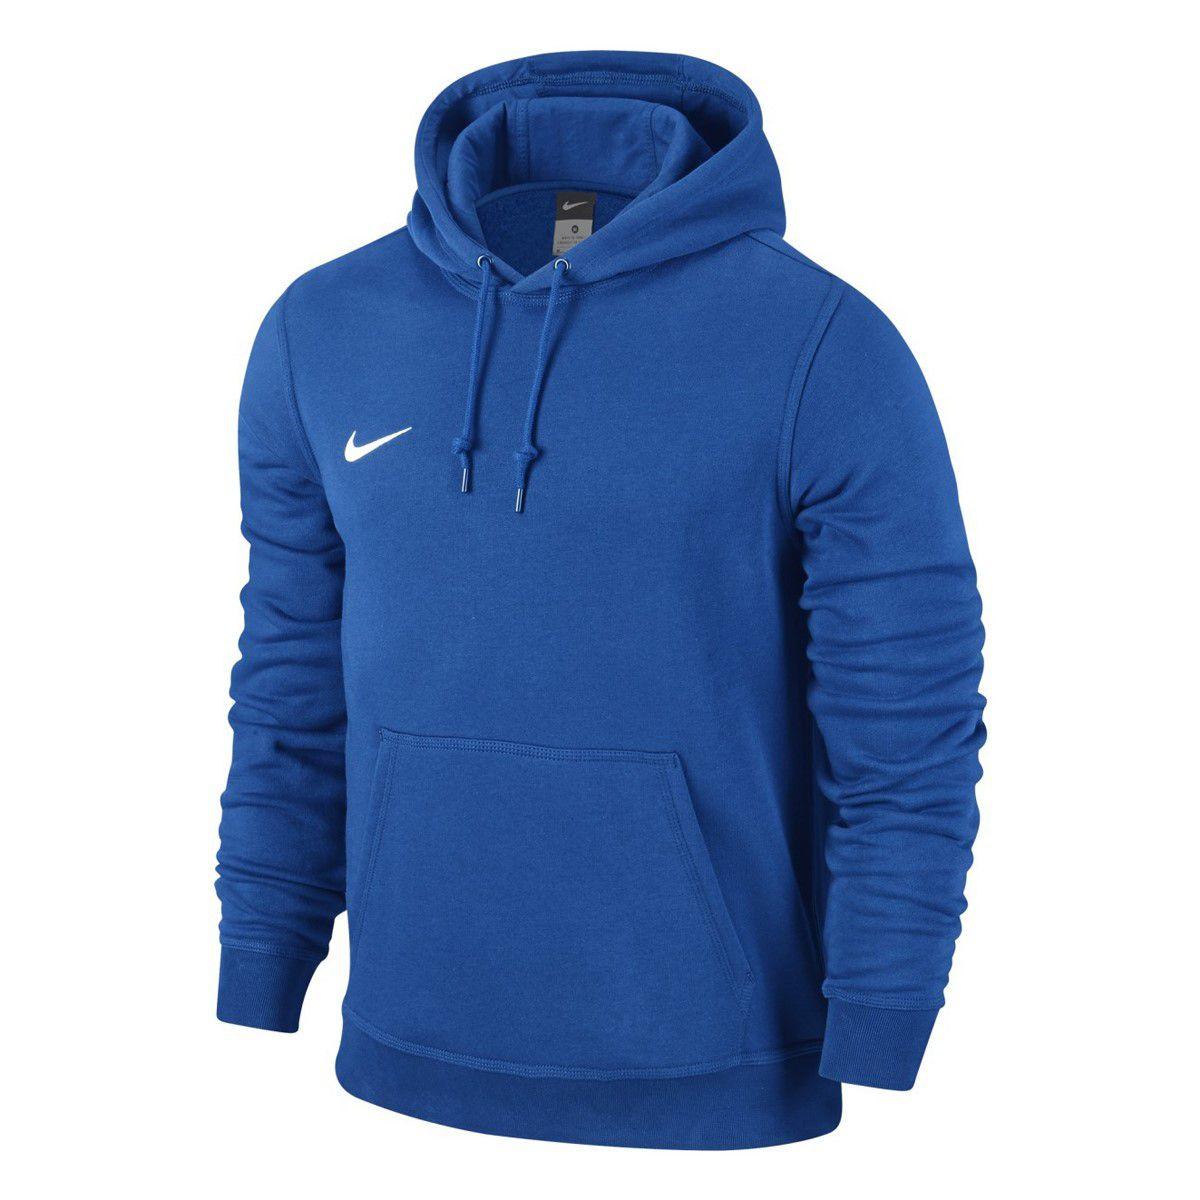 Nike Team Club Hoody Sweatshirt 658498463